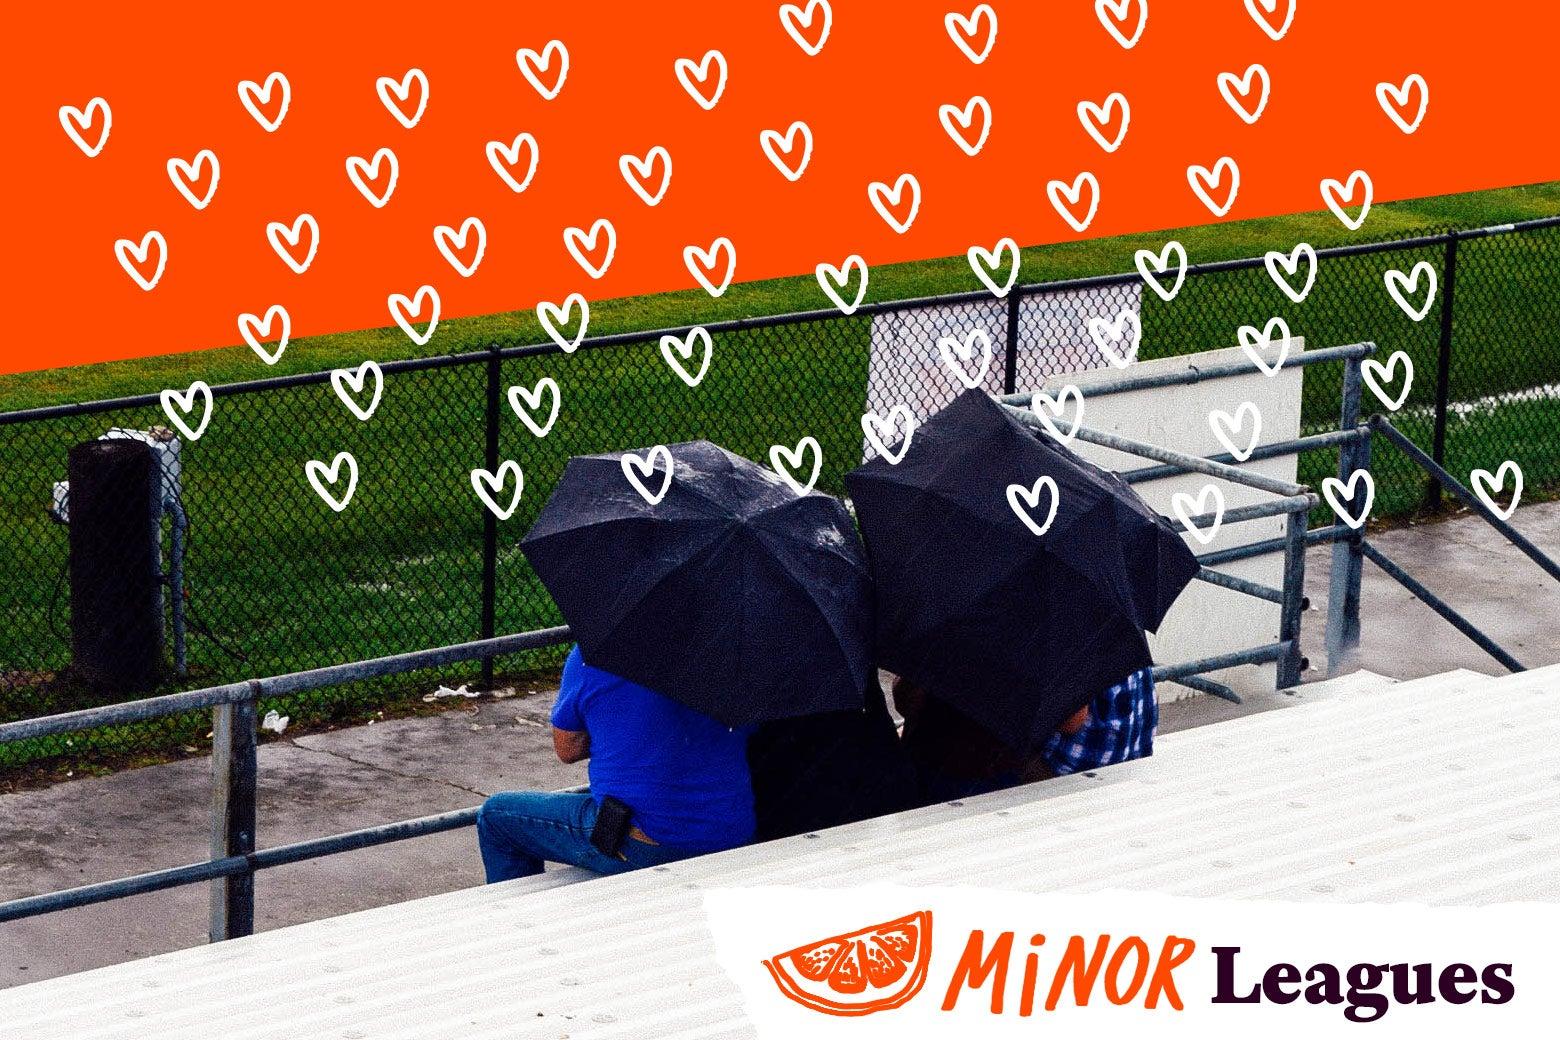 Parents on the bleachers under umbrellas as hearts rain down.